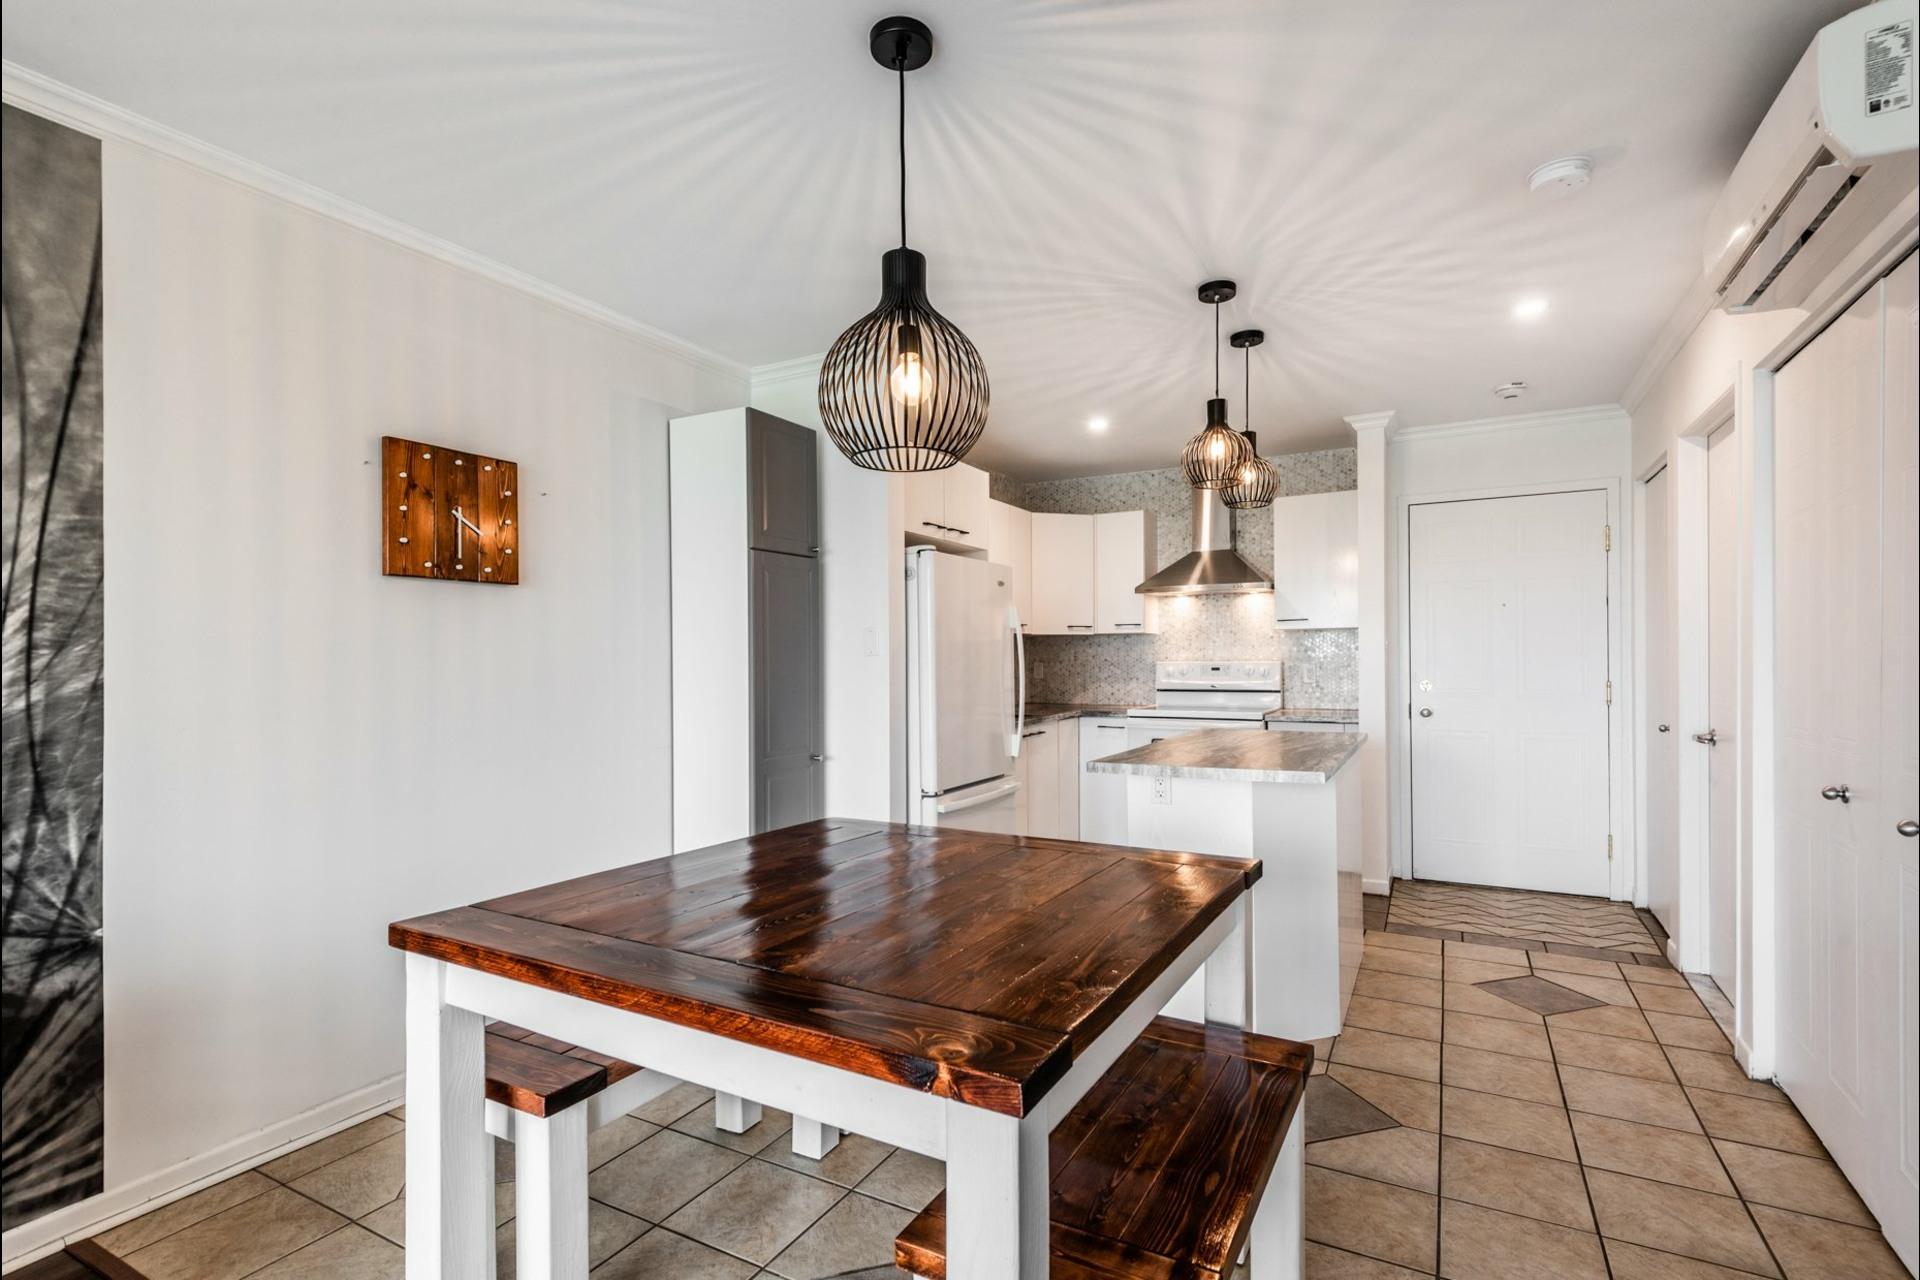 image 9 - Apartment For sale Saint-Hubert Longueuil  - 4 rooms